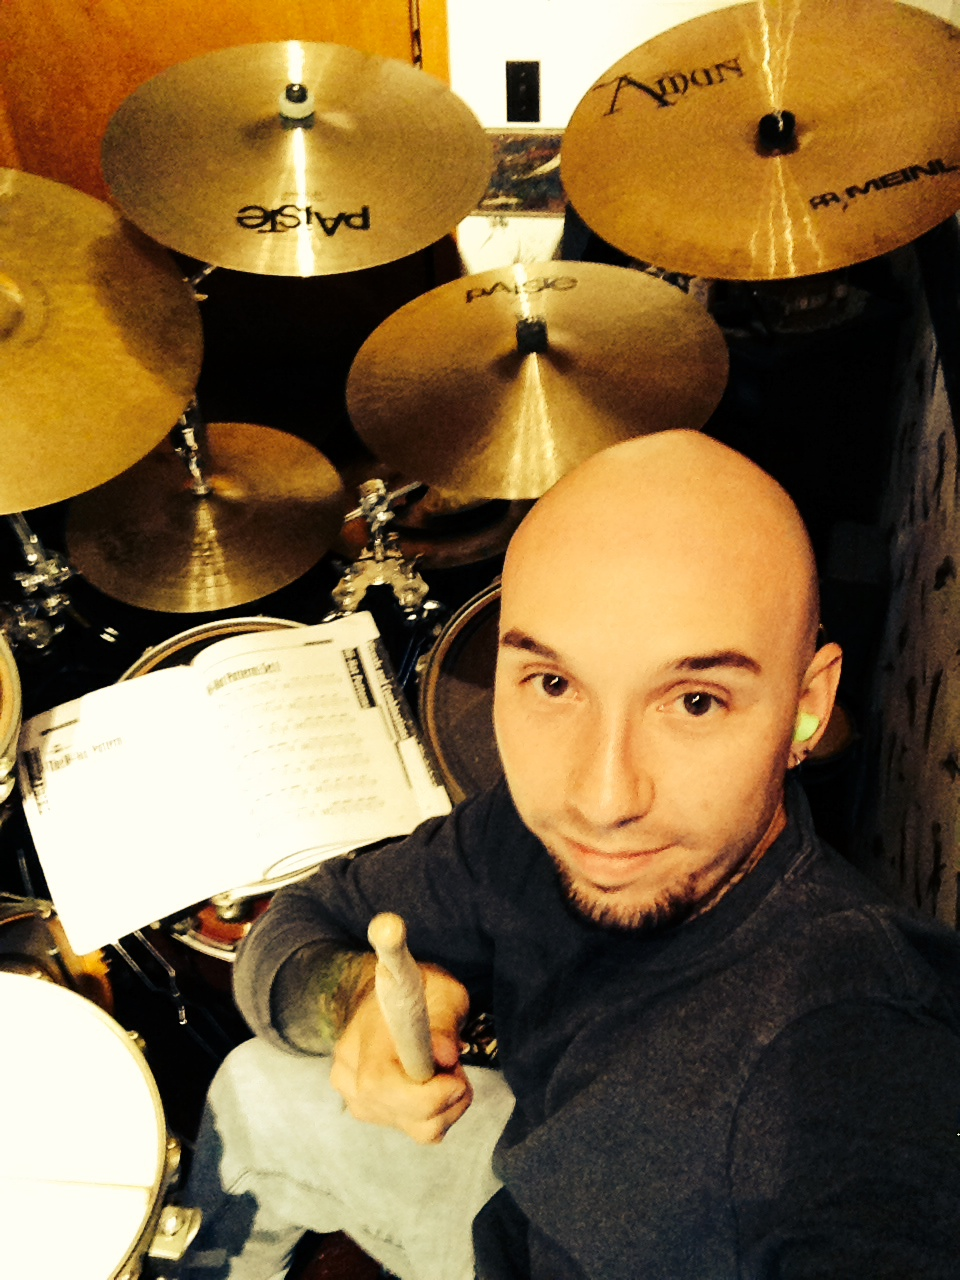 Greg Collister Drum 04.JPG